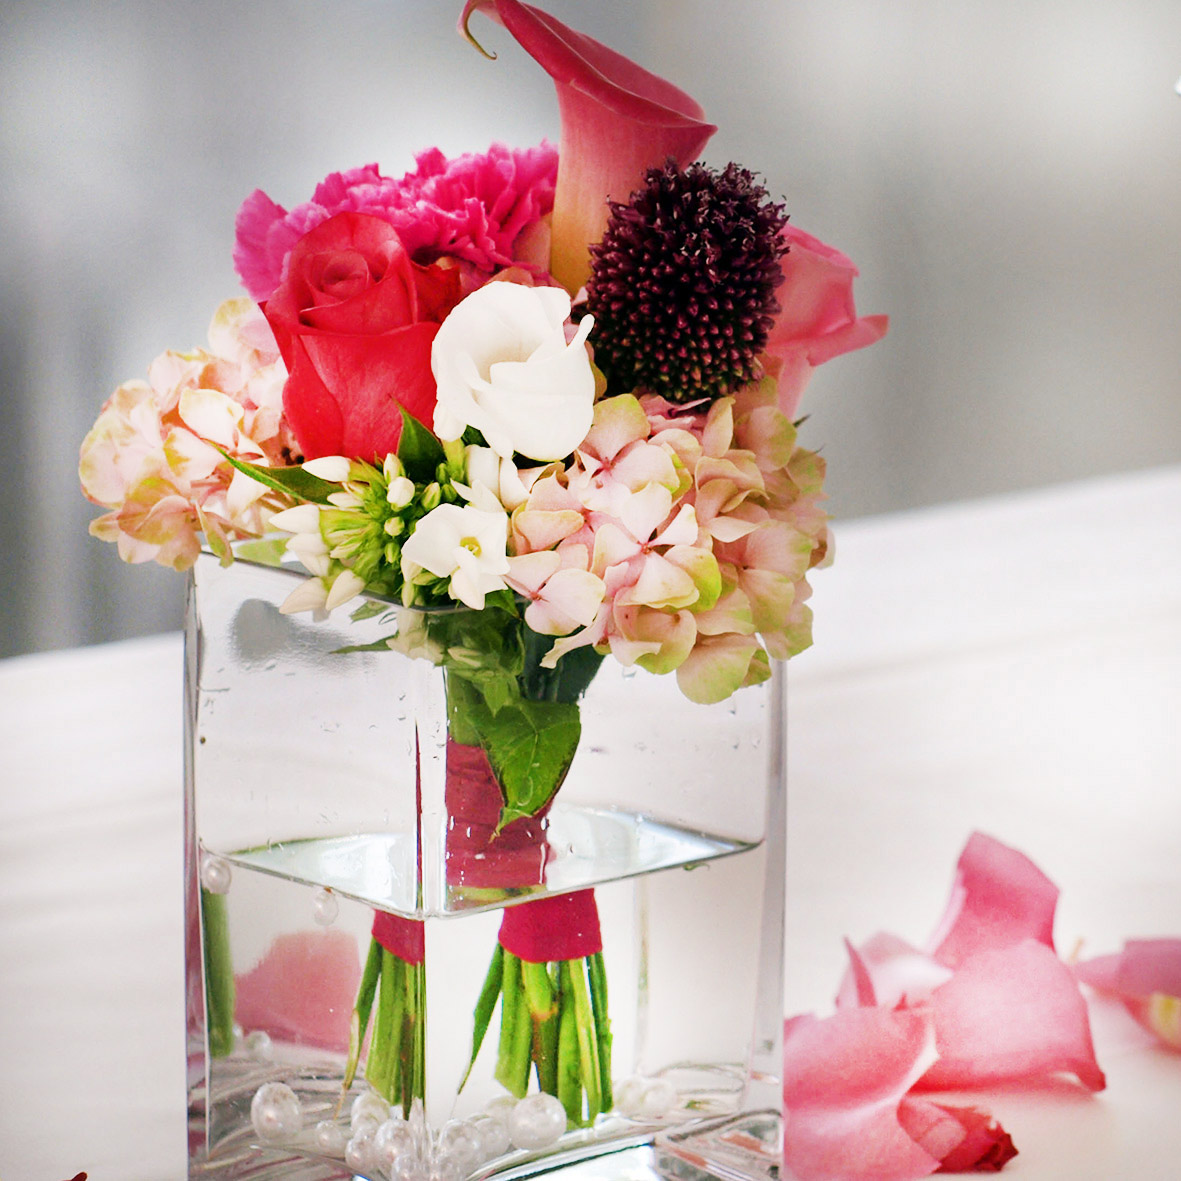 Vase Matrix